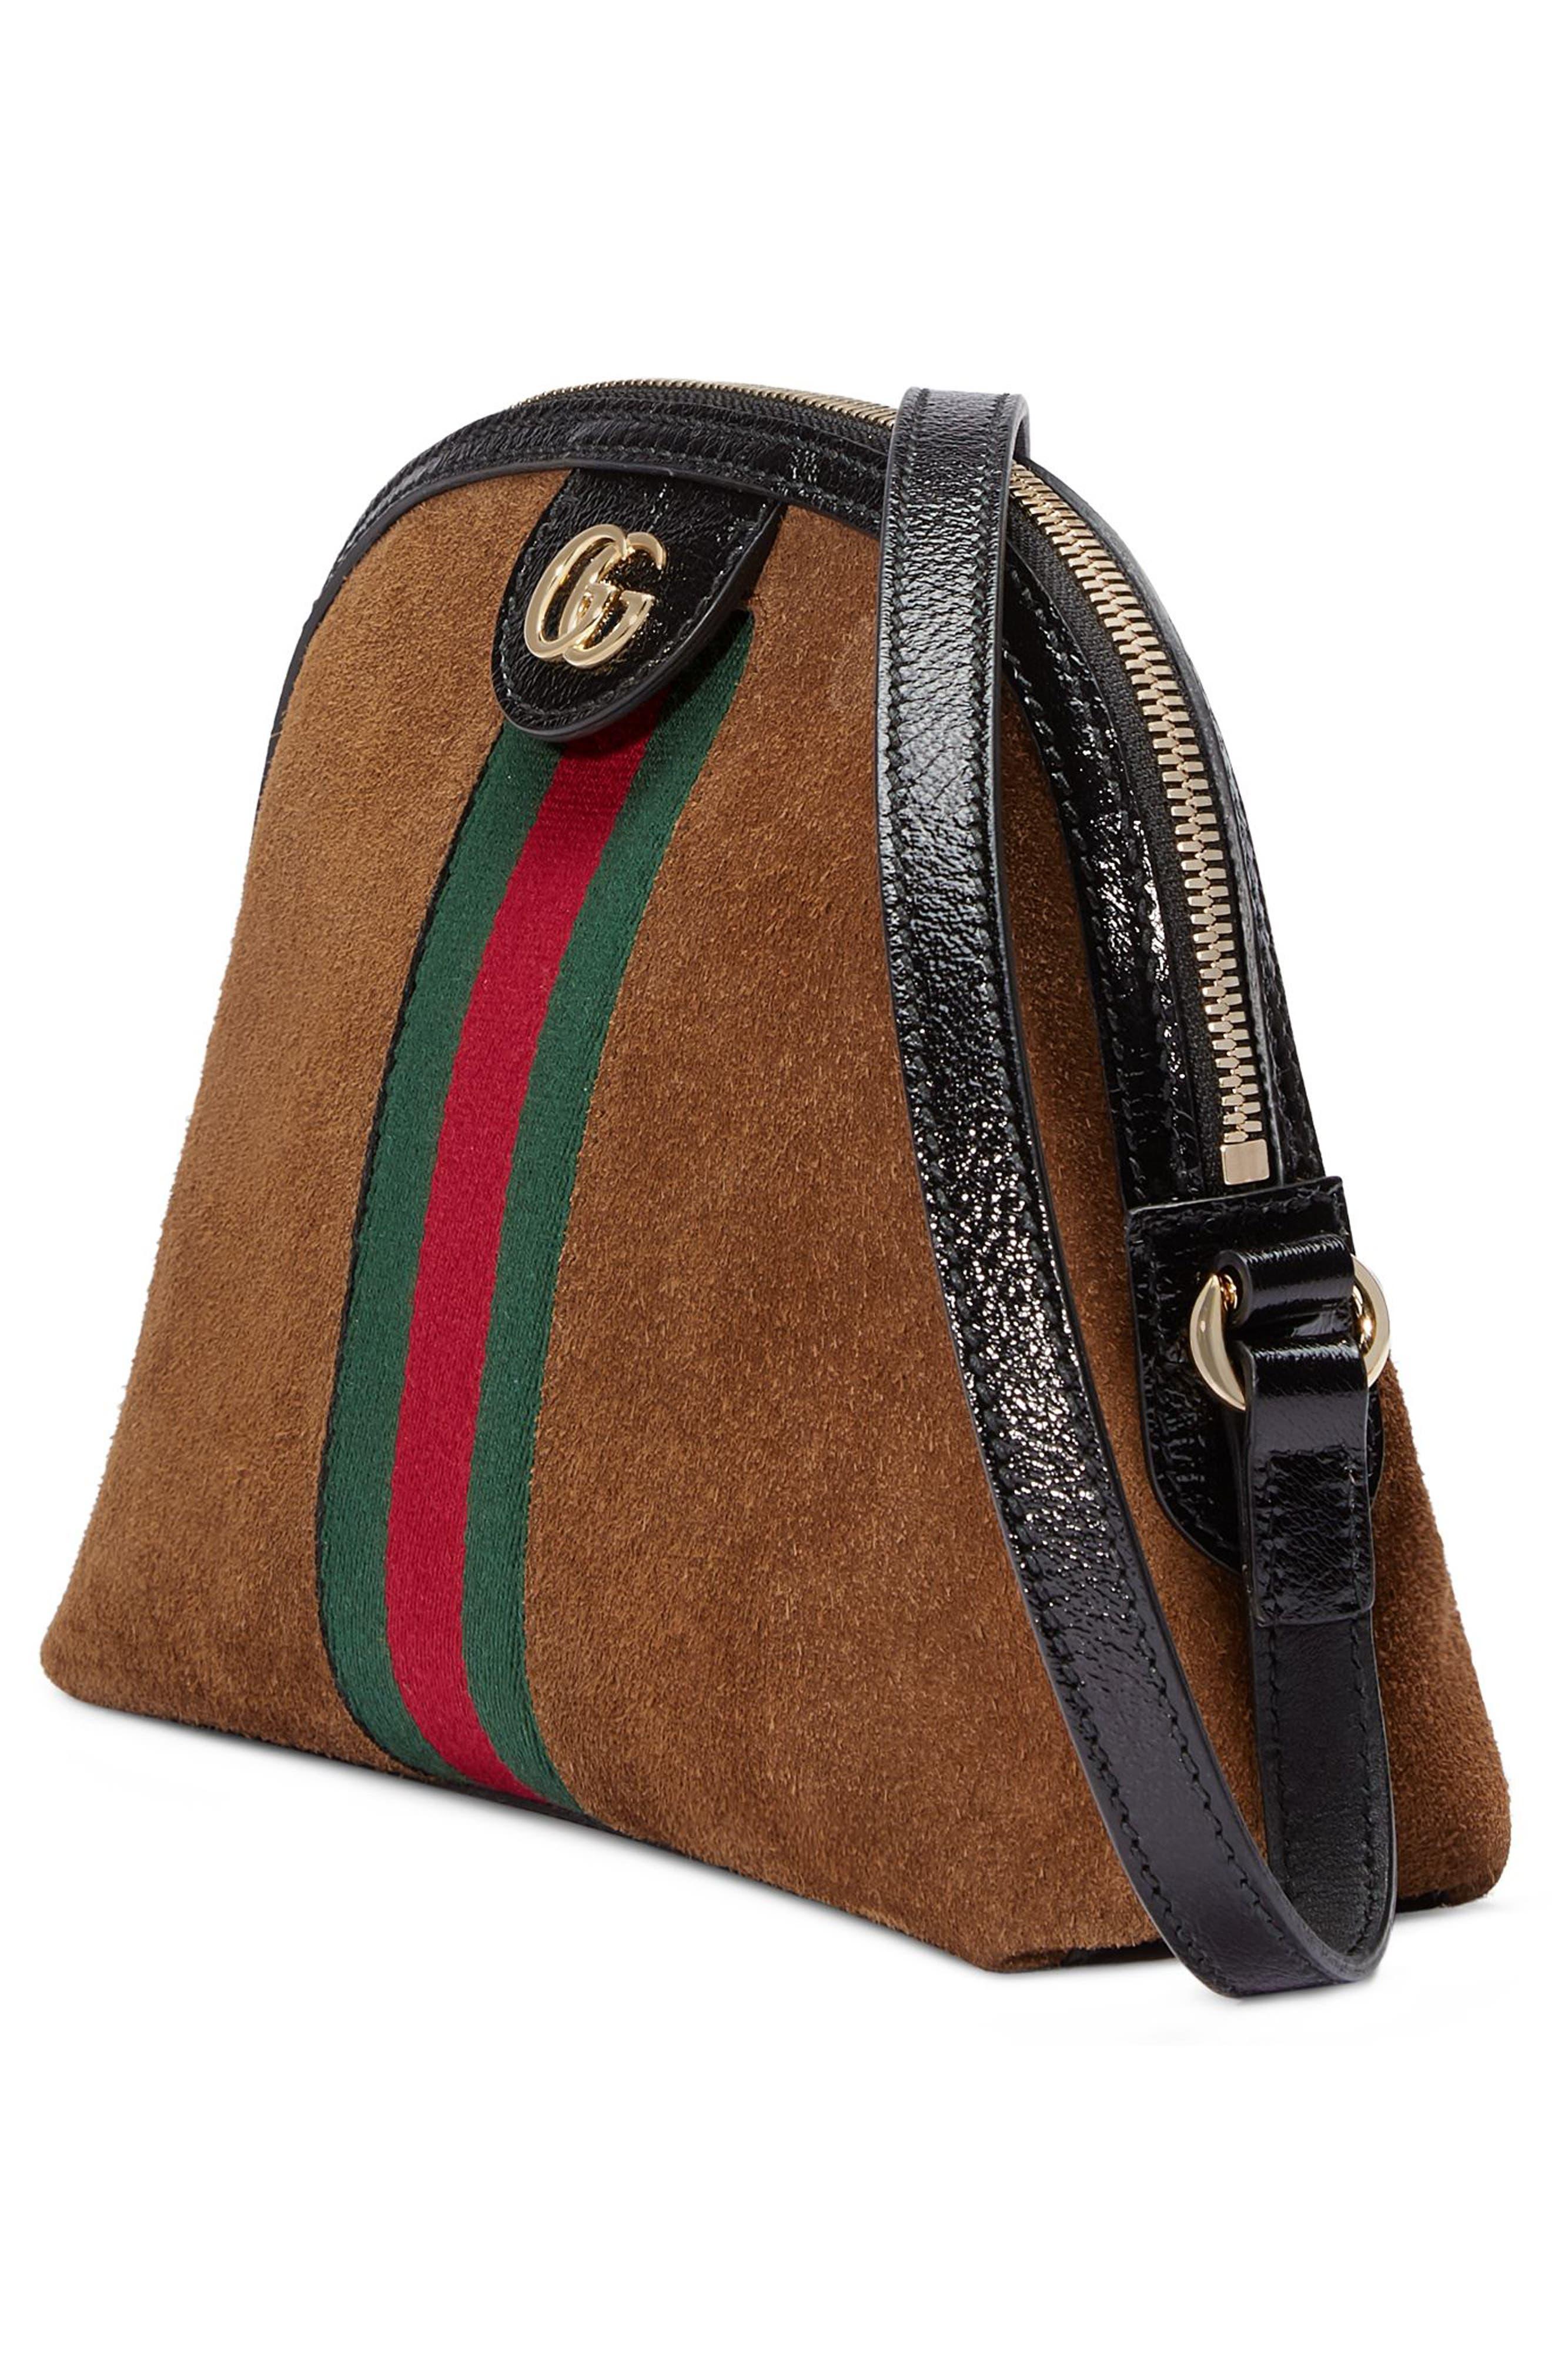 Small Suede Shoulder Bag,                             Alternate thumbnail 4, color,                             Nocciola/ Nero/ Vert Red Vert